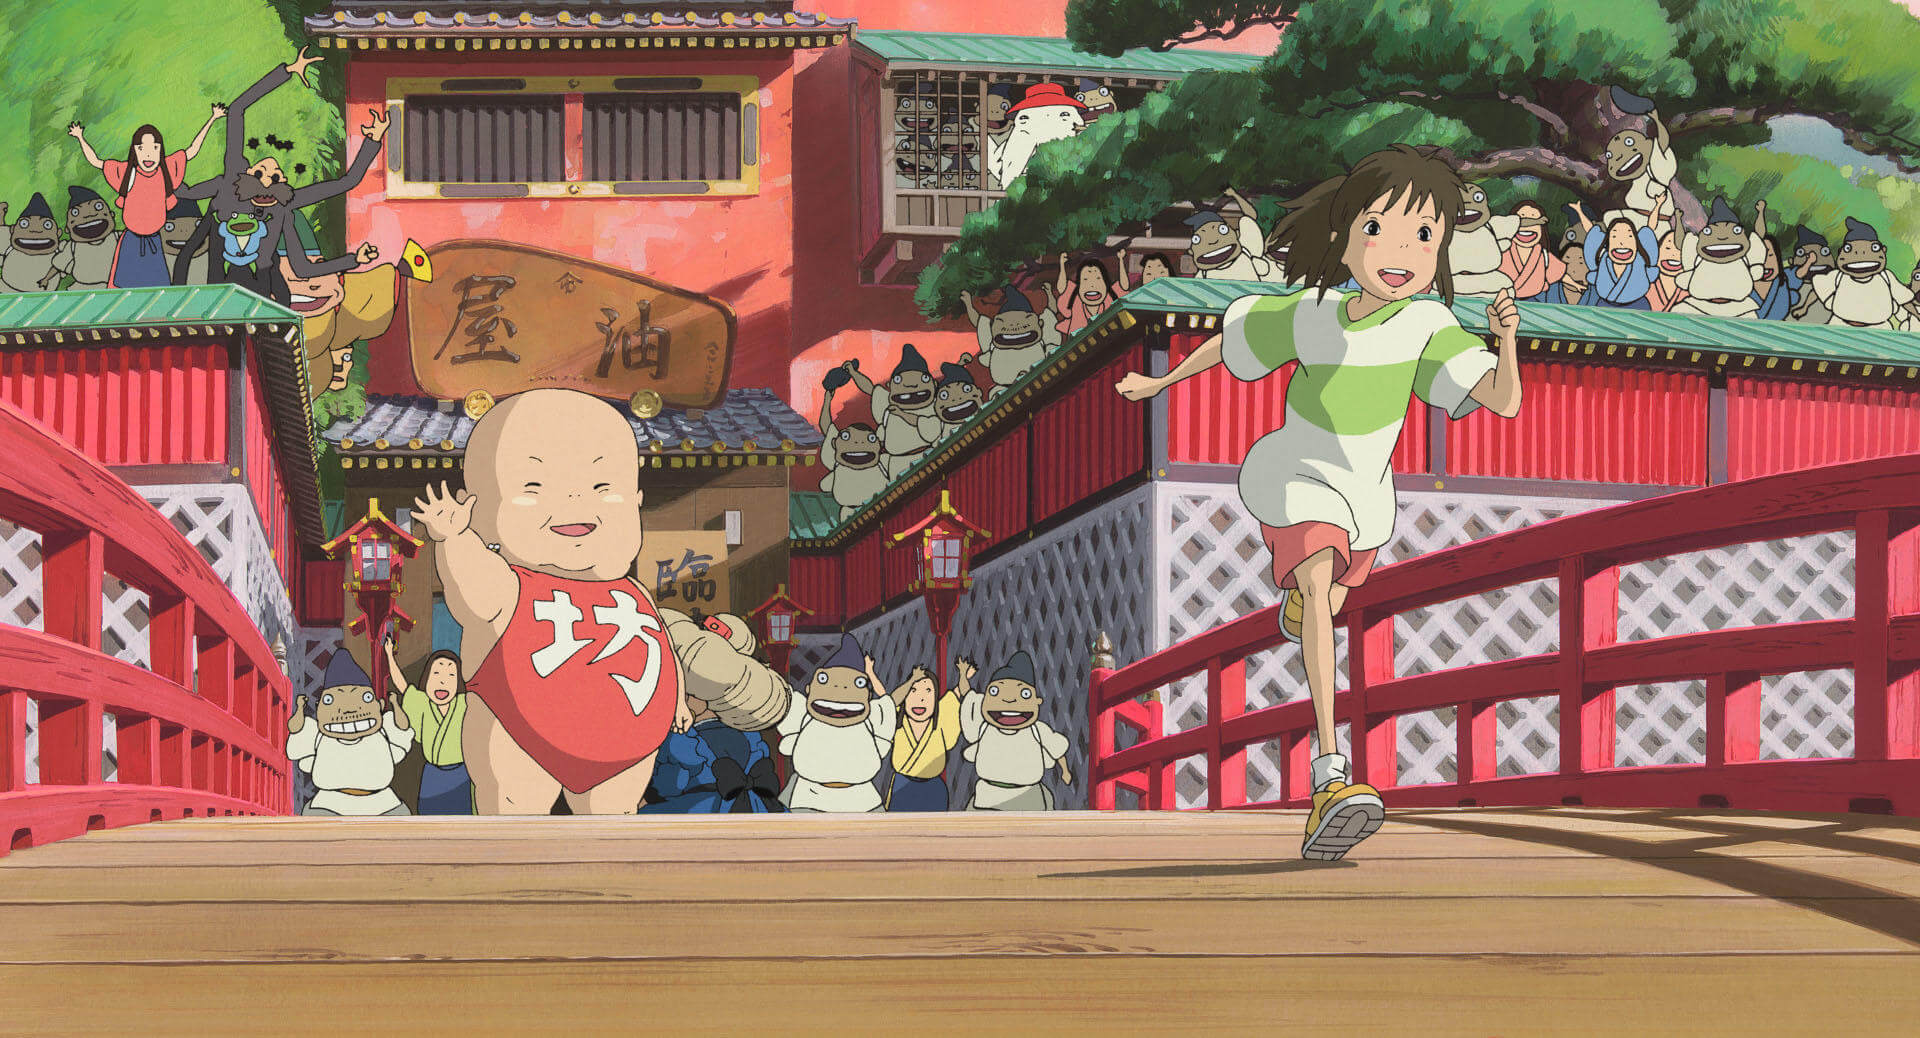 anime-art-studio-ghibli